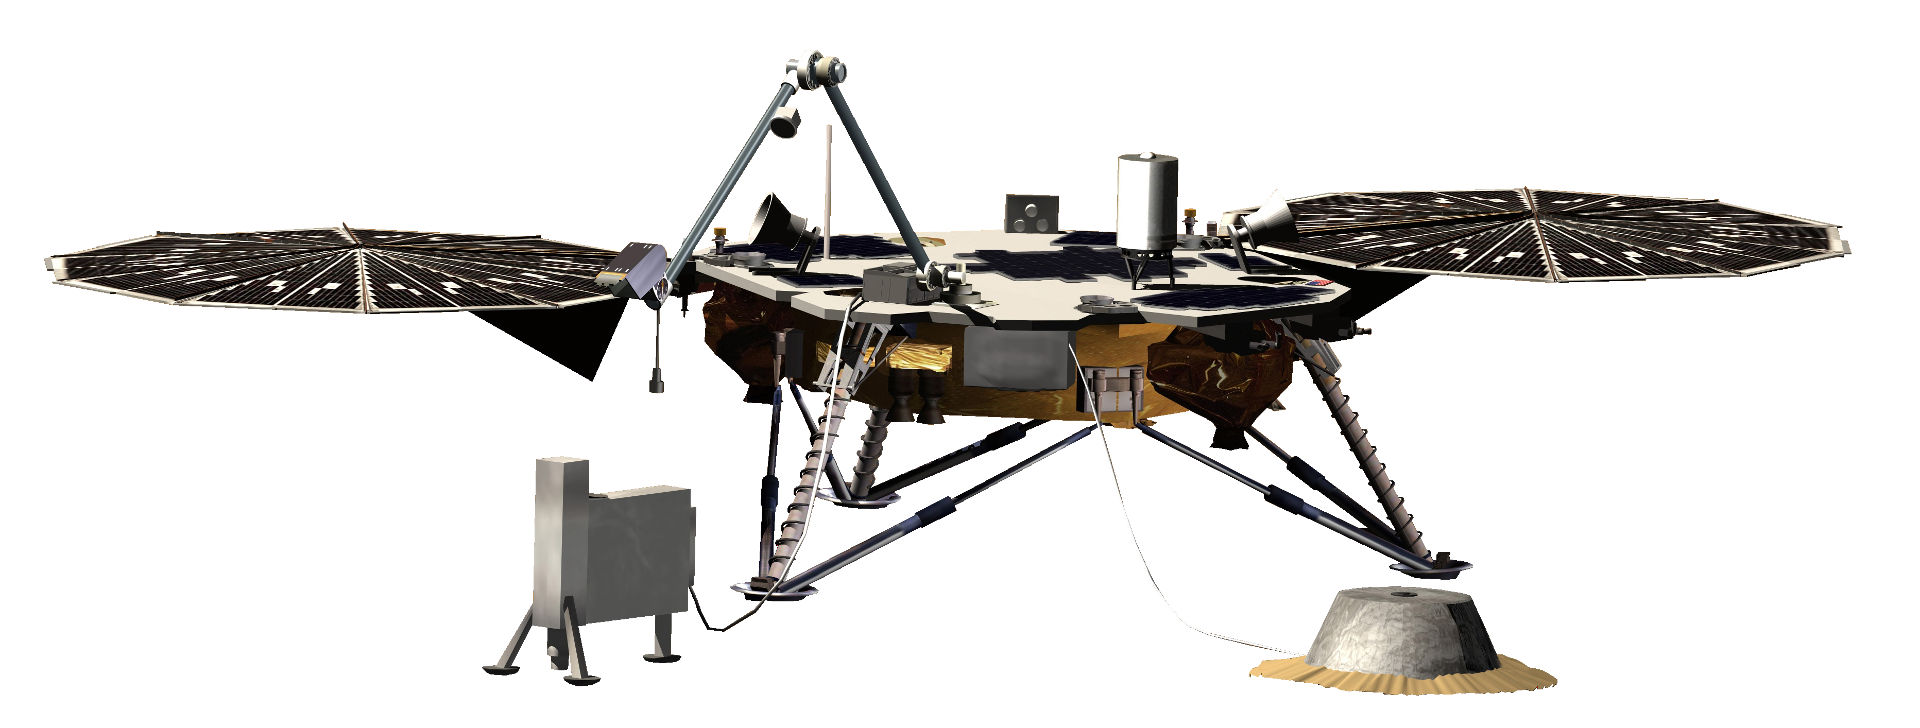 InSight (Creds: NASA/JPL)